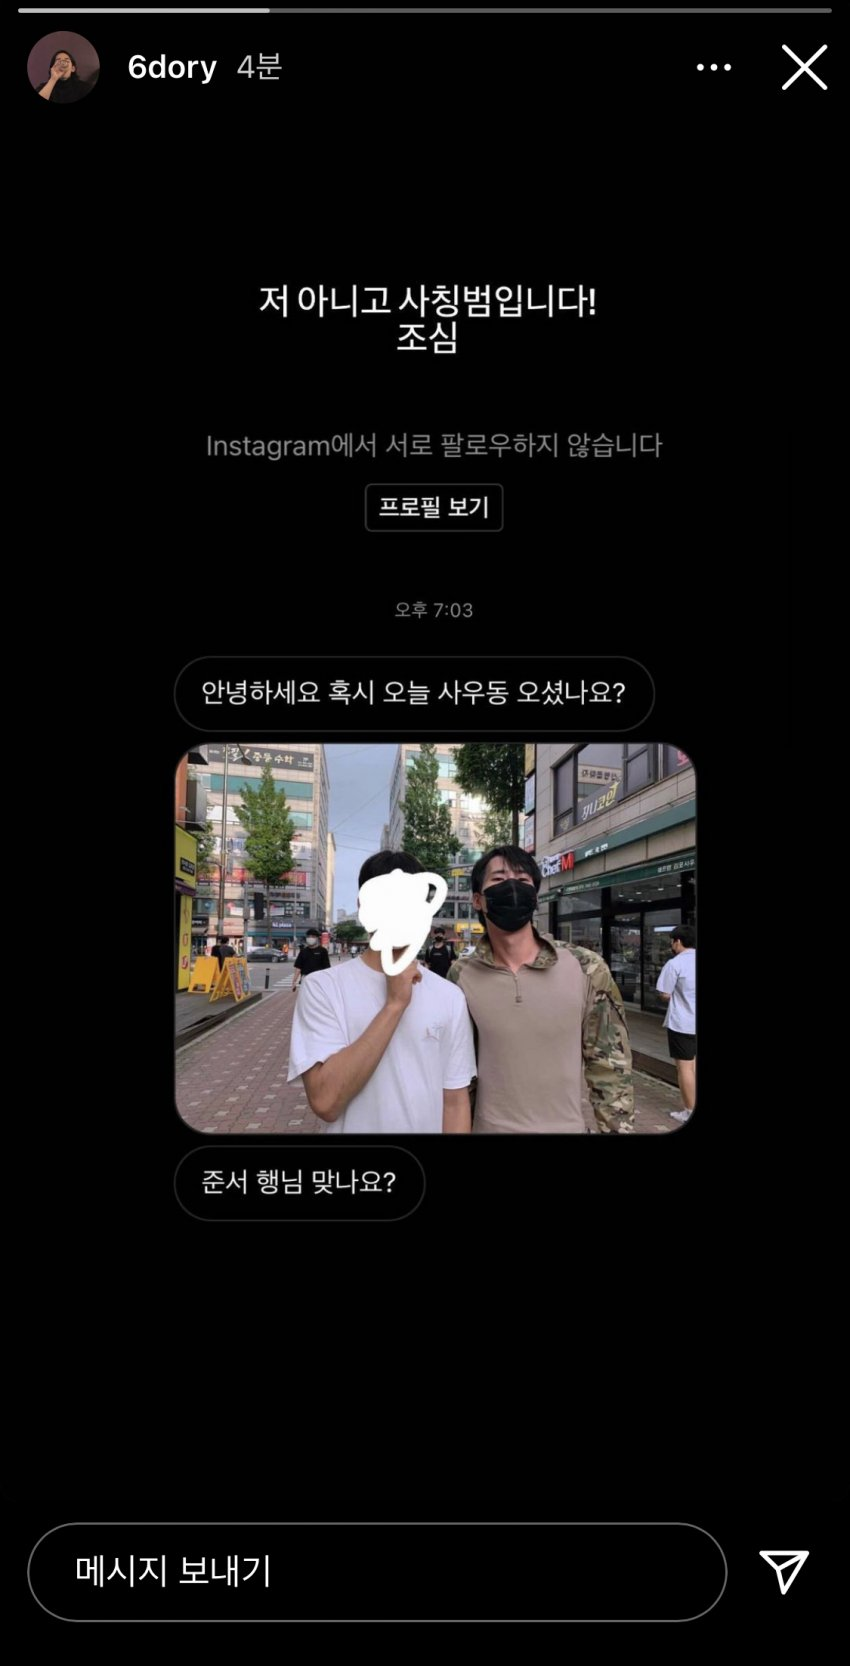 viewimage.php?id=24afdf28e8d736&no=24b0d769e1d32ca73cec8efa11d02831ed3c848cabfee483347b0cb095af03cbd08c050710a3777711fb5f2d996c45c44292eccacb76485cdba01048ba805690079055eff4eb3667a9588278b090c77872915d328a07f46a5dba5b4b836ccd2cbe12619e43e805